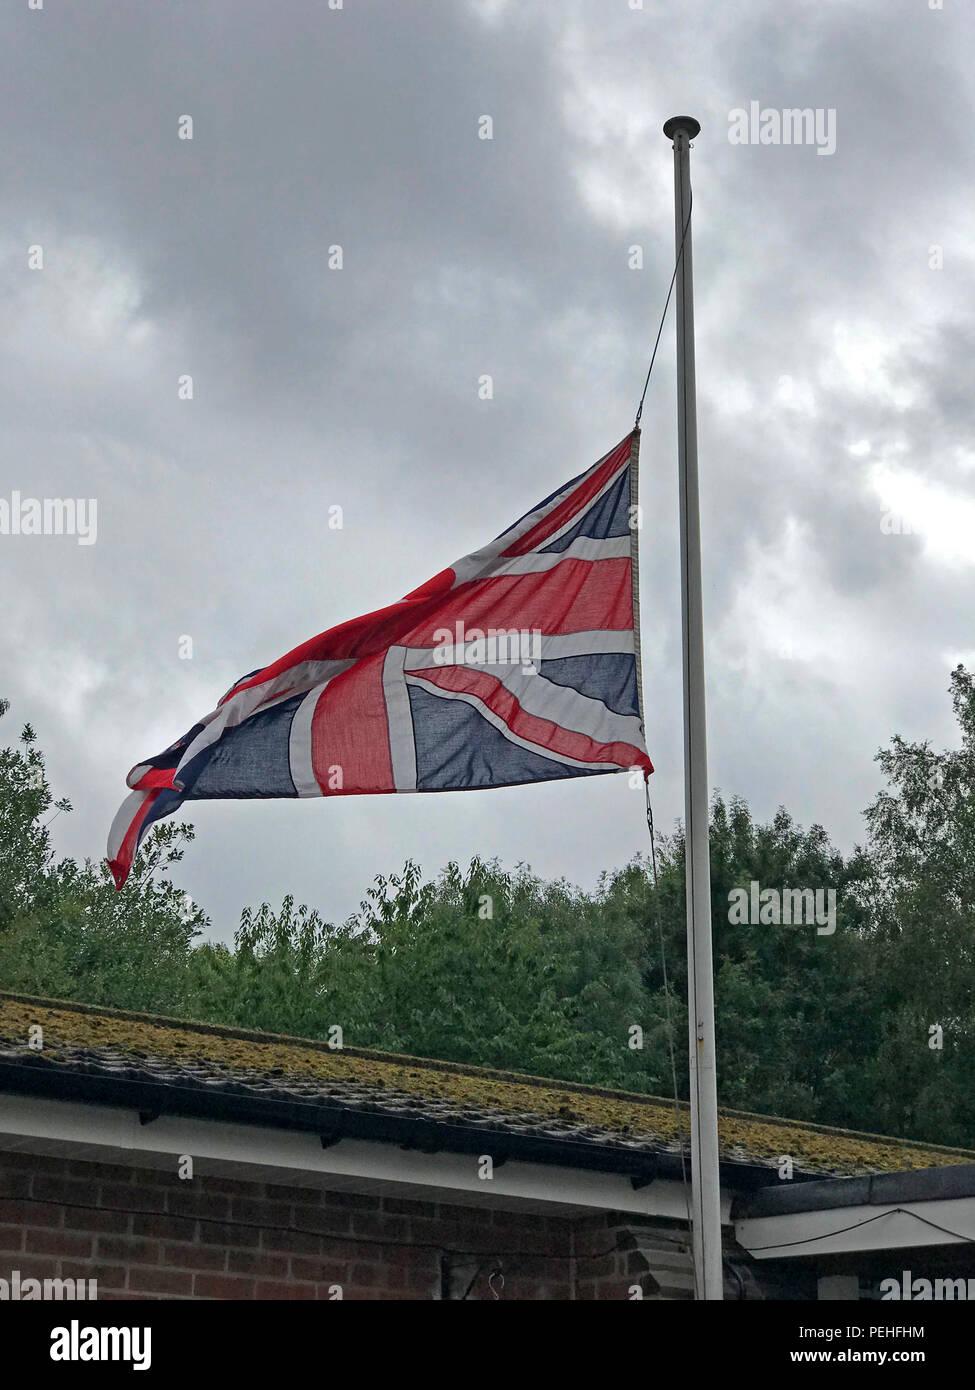 HotpixUK,GoTonySmith,British flag,brexit flag,The union flag,pole,flagpole,flag pole,British flag protocol,Union jack,Union Jack flag,Flag regulations,the flags regulations,National flag,uk,go,United Kingdom,Britain,Great Britain,grappenhall,Thelwall,Grappenhall,Grappenhall & Thelwall British legion,Warrington,Cheshire,North West England,UK,England,English,flag,National Mourning,National,Mourning,occasion,special,special occasion,half-mast